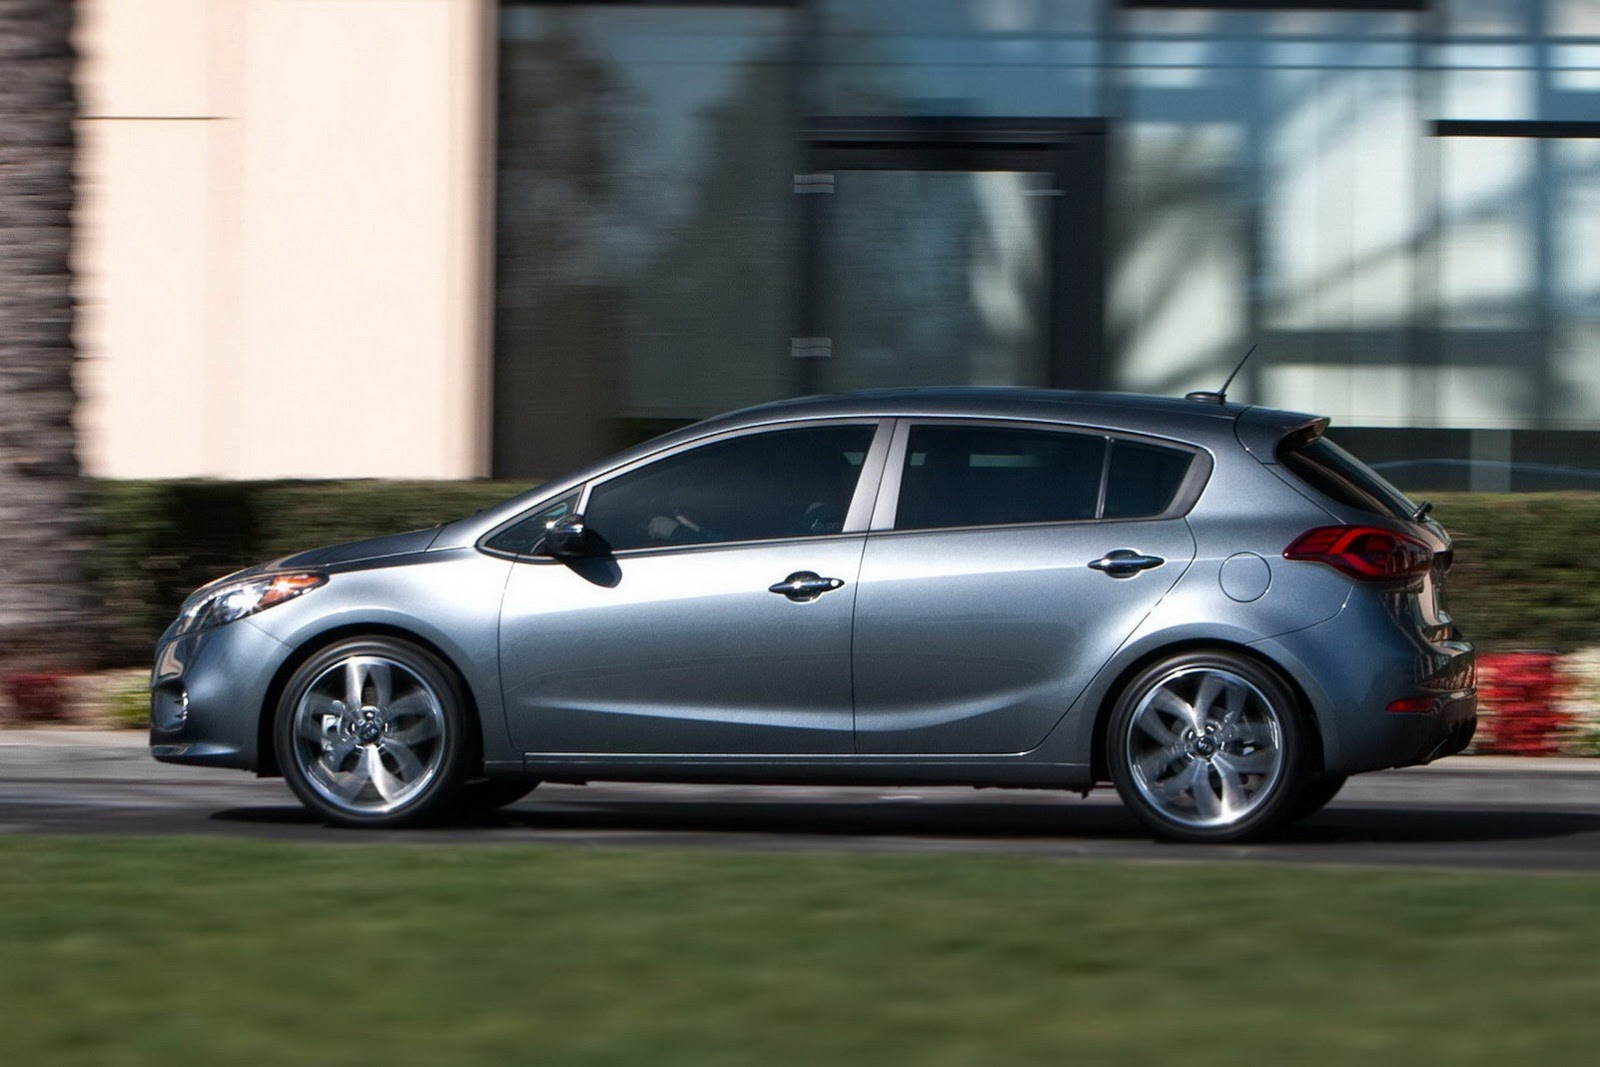 2014 Kia Forte 5 Door Debuts With 201hp Turbo Gdi Video